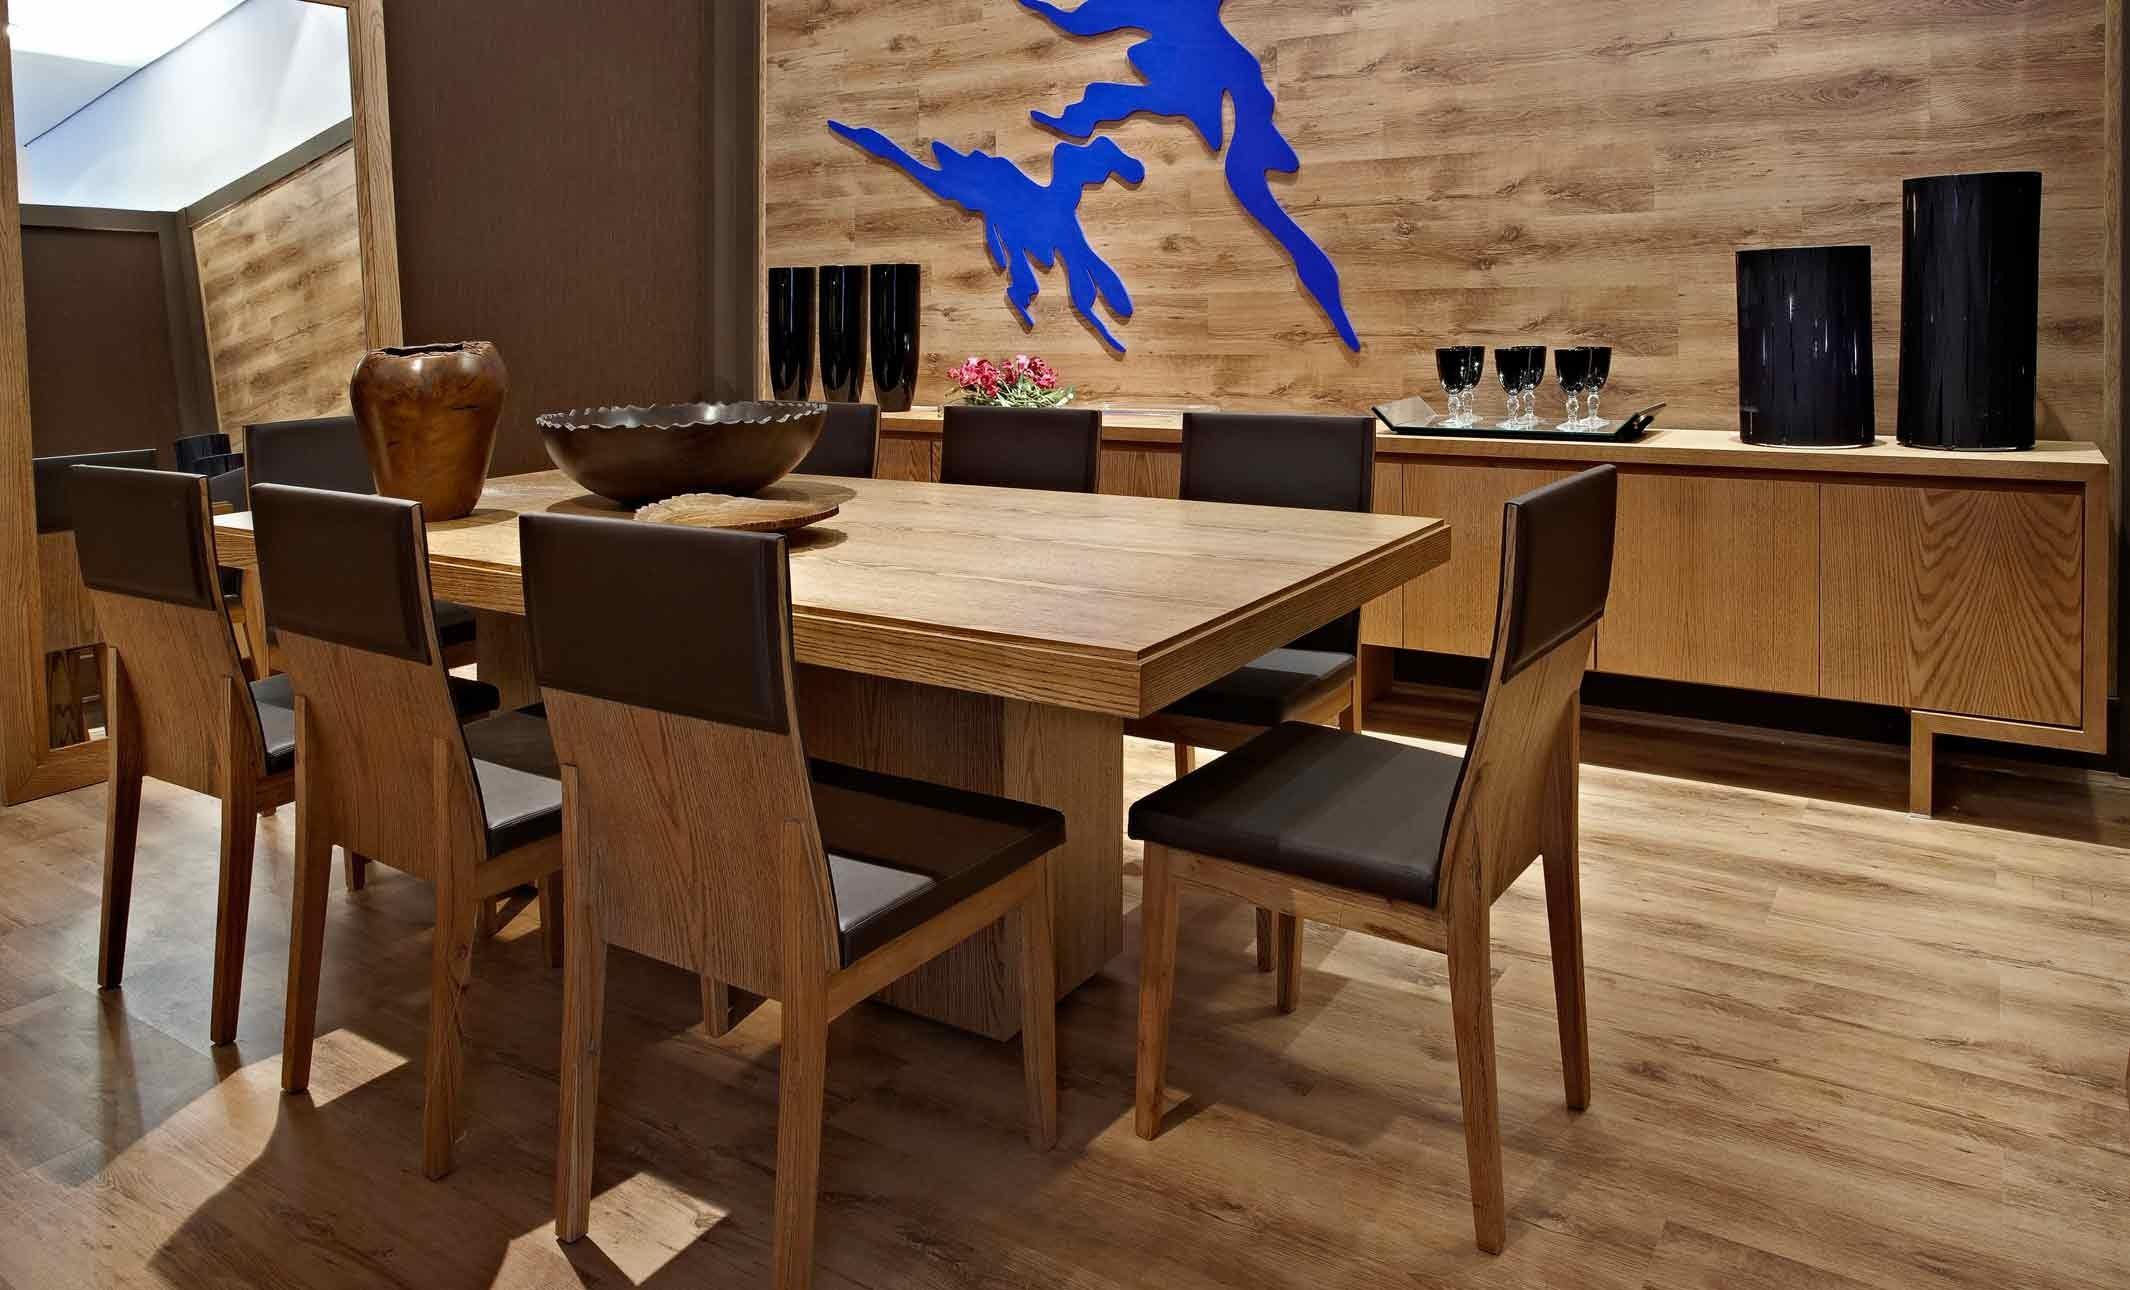 Mesa de jantar ideias e modelos de mesas de jantar for Modelos mesas para cafeteria